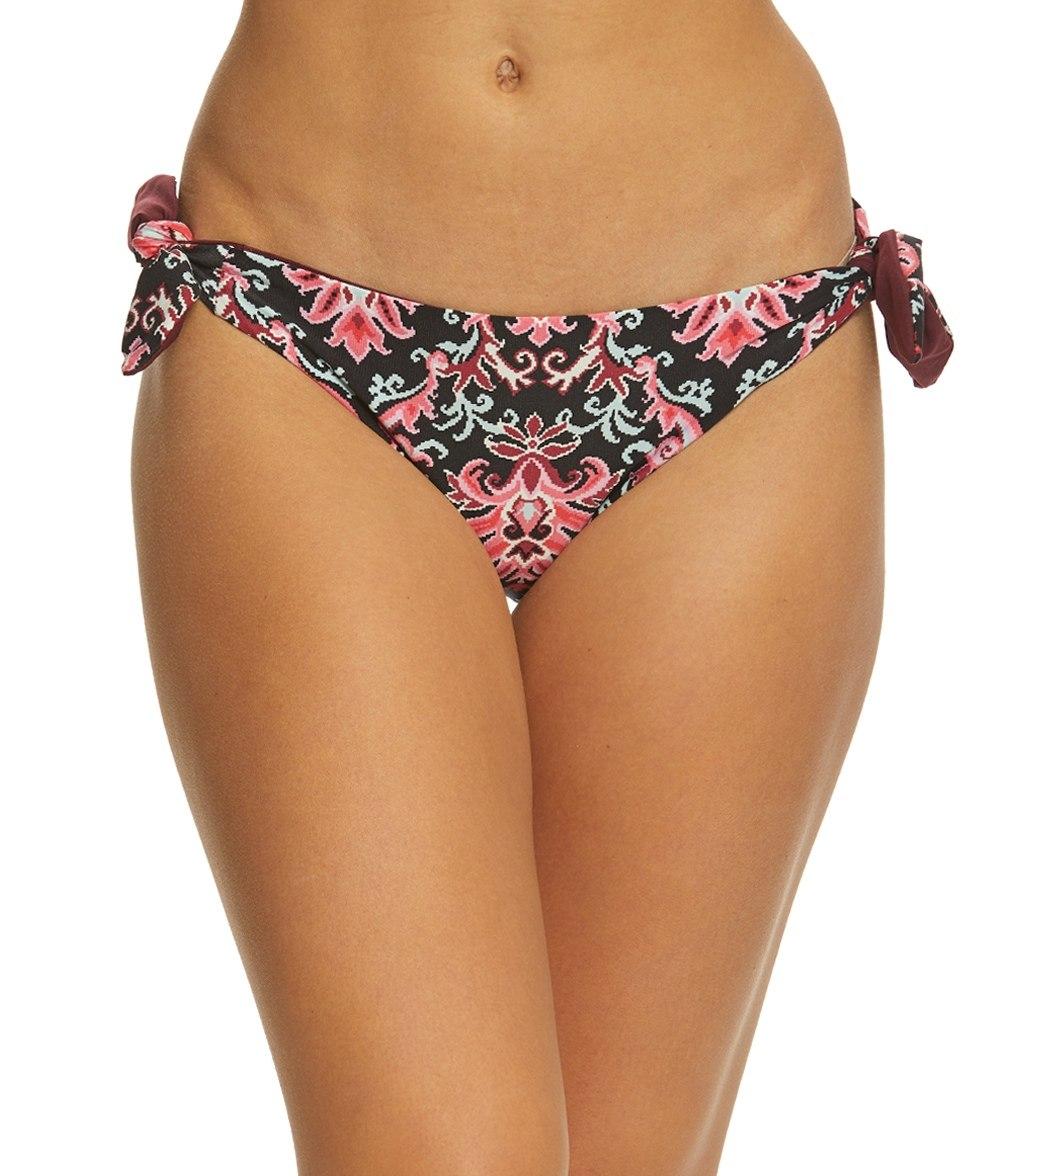 f897585161 Kate Spade New York Oasis Beach Reversible Bikini Bottom at SwimOutlet.com  - Free Shipping